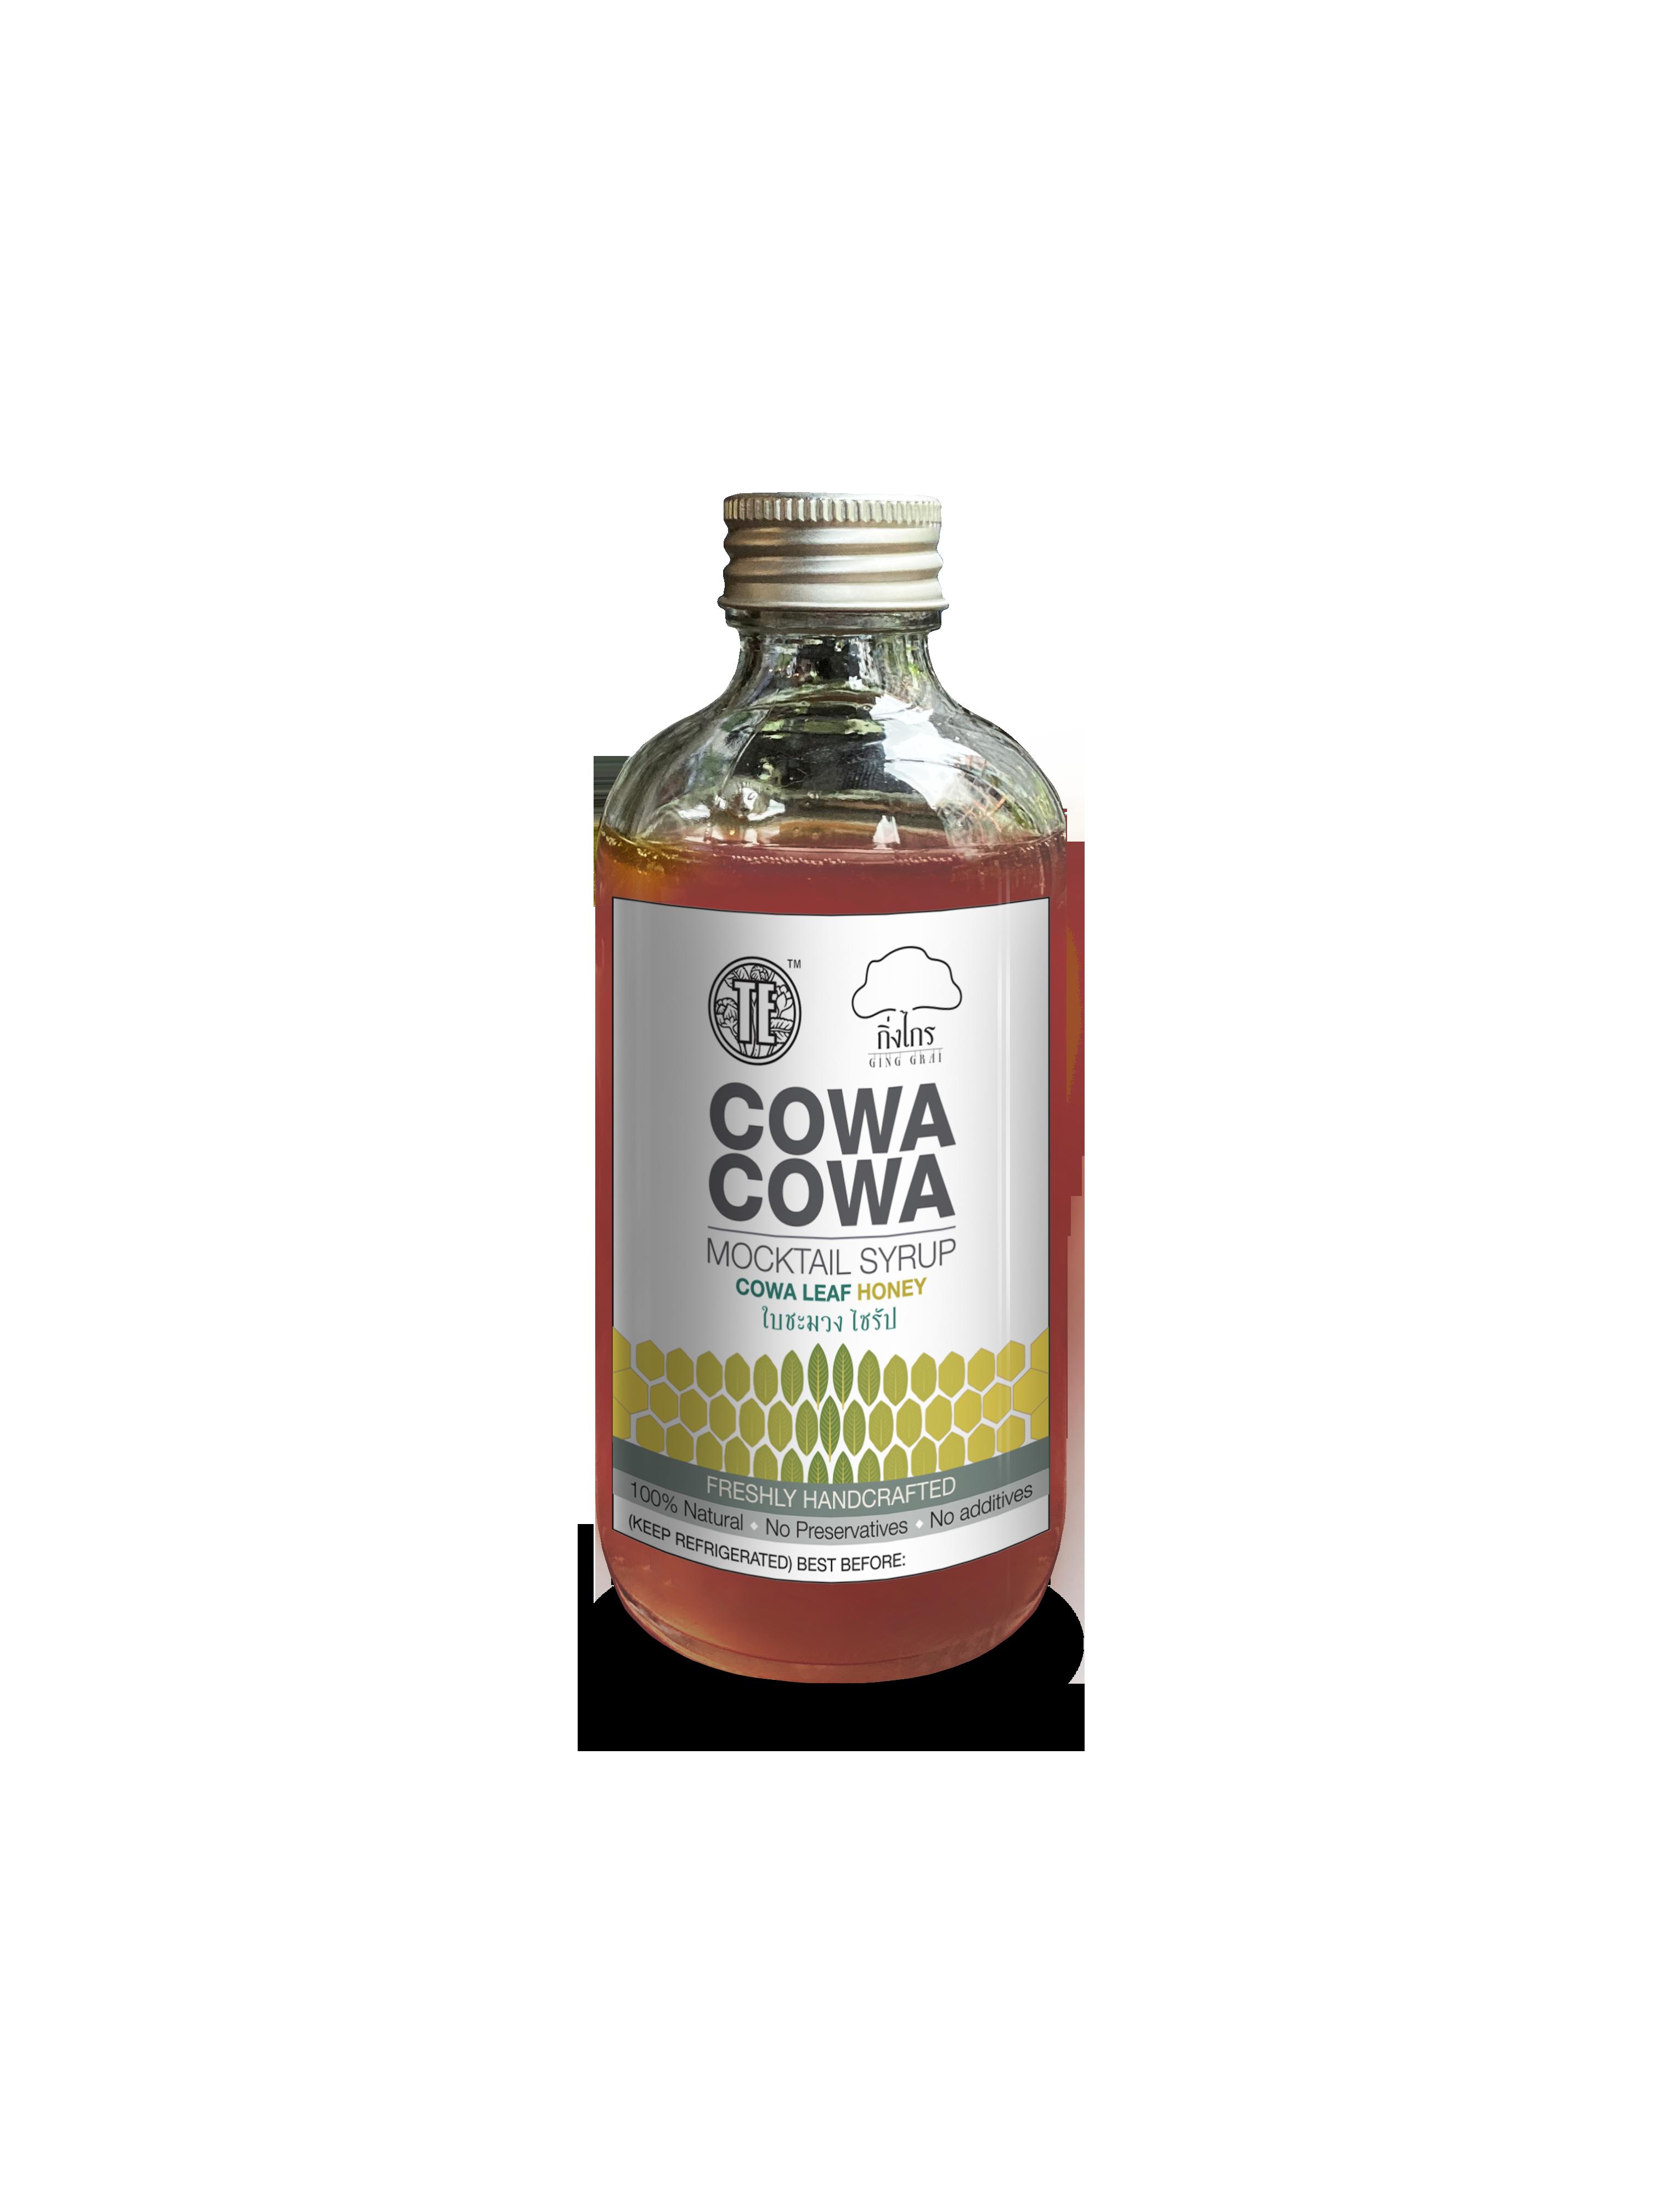 Cowa Cowa Mocktail Syrup ใบชะมวงไซรัป